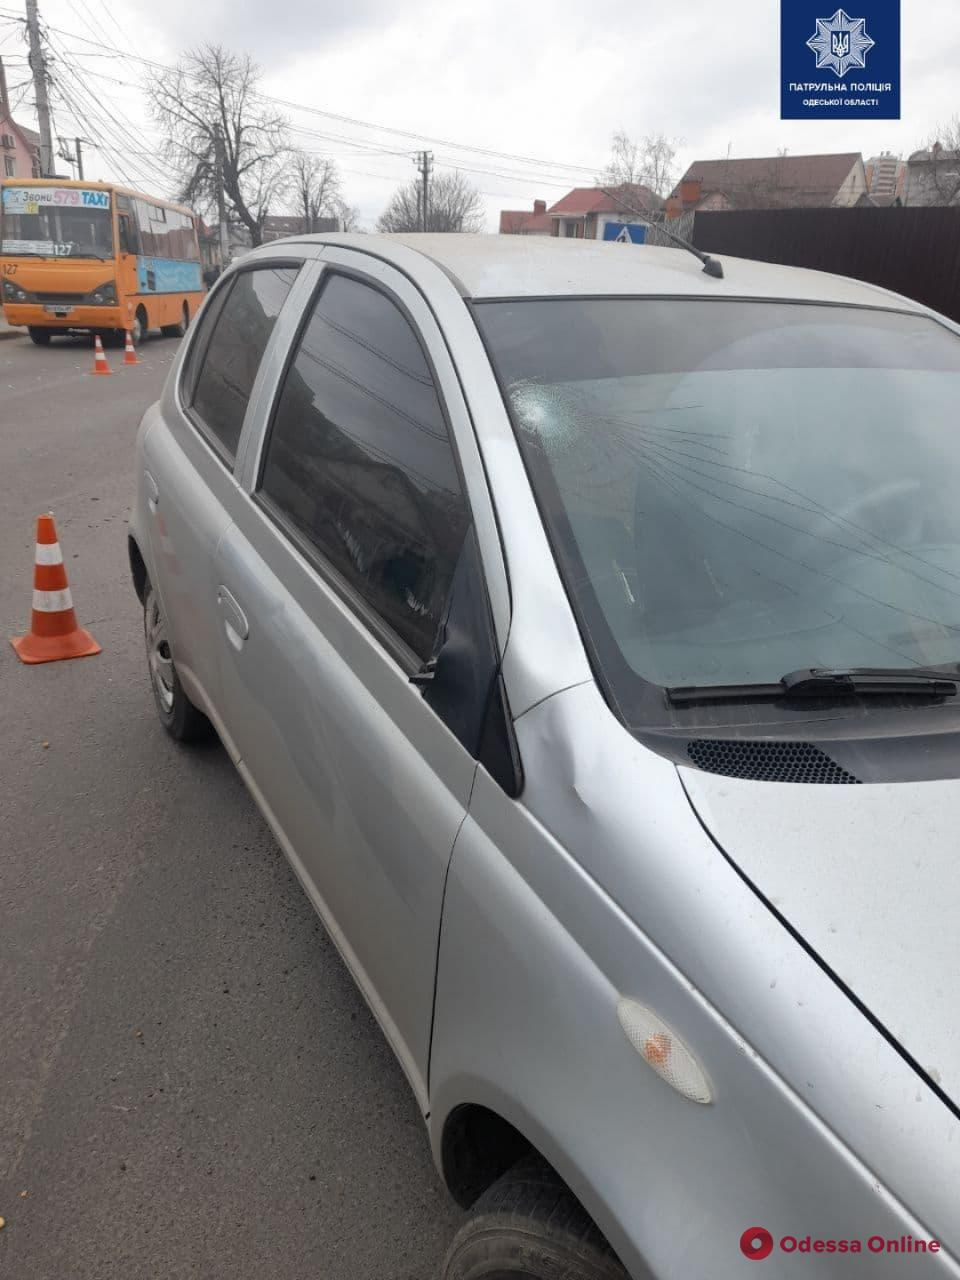 На Дмитрия Донского сбили пешехода